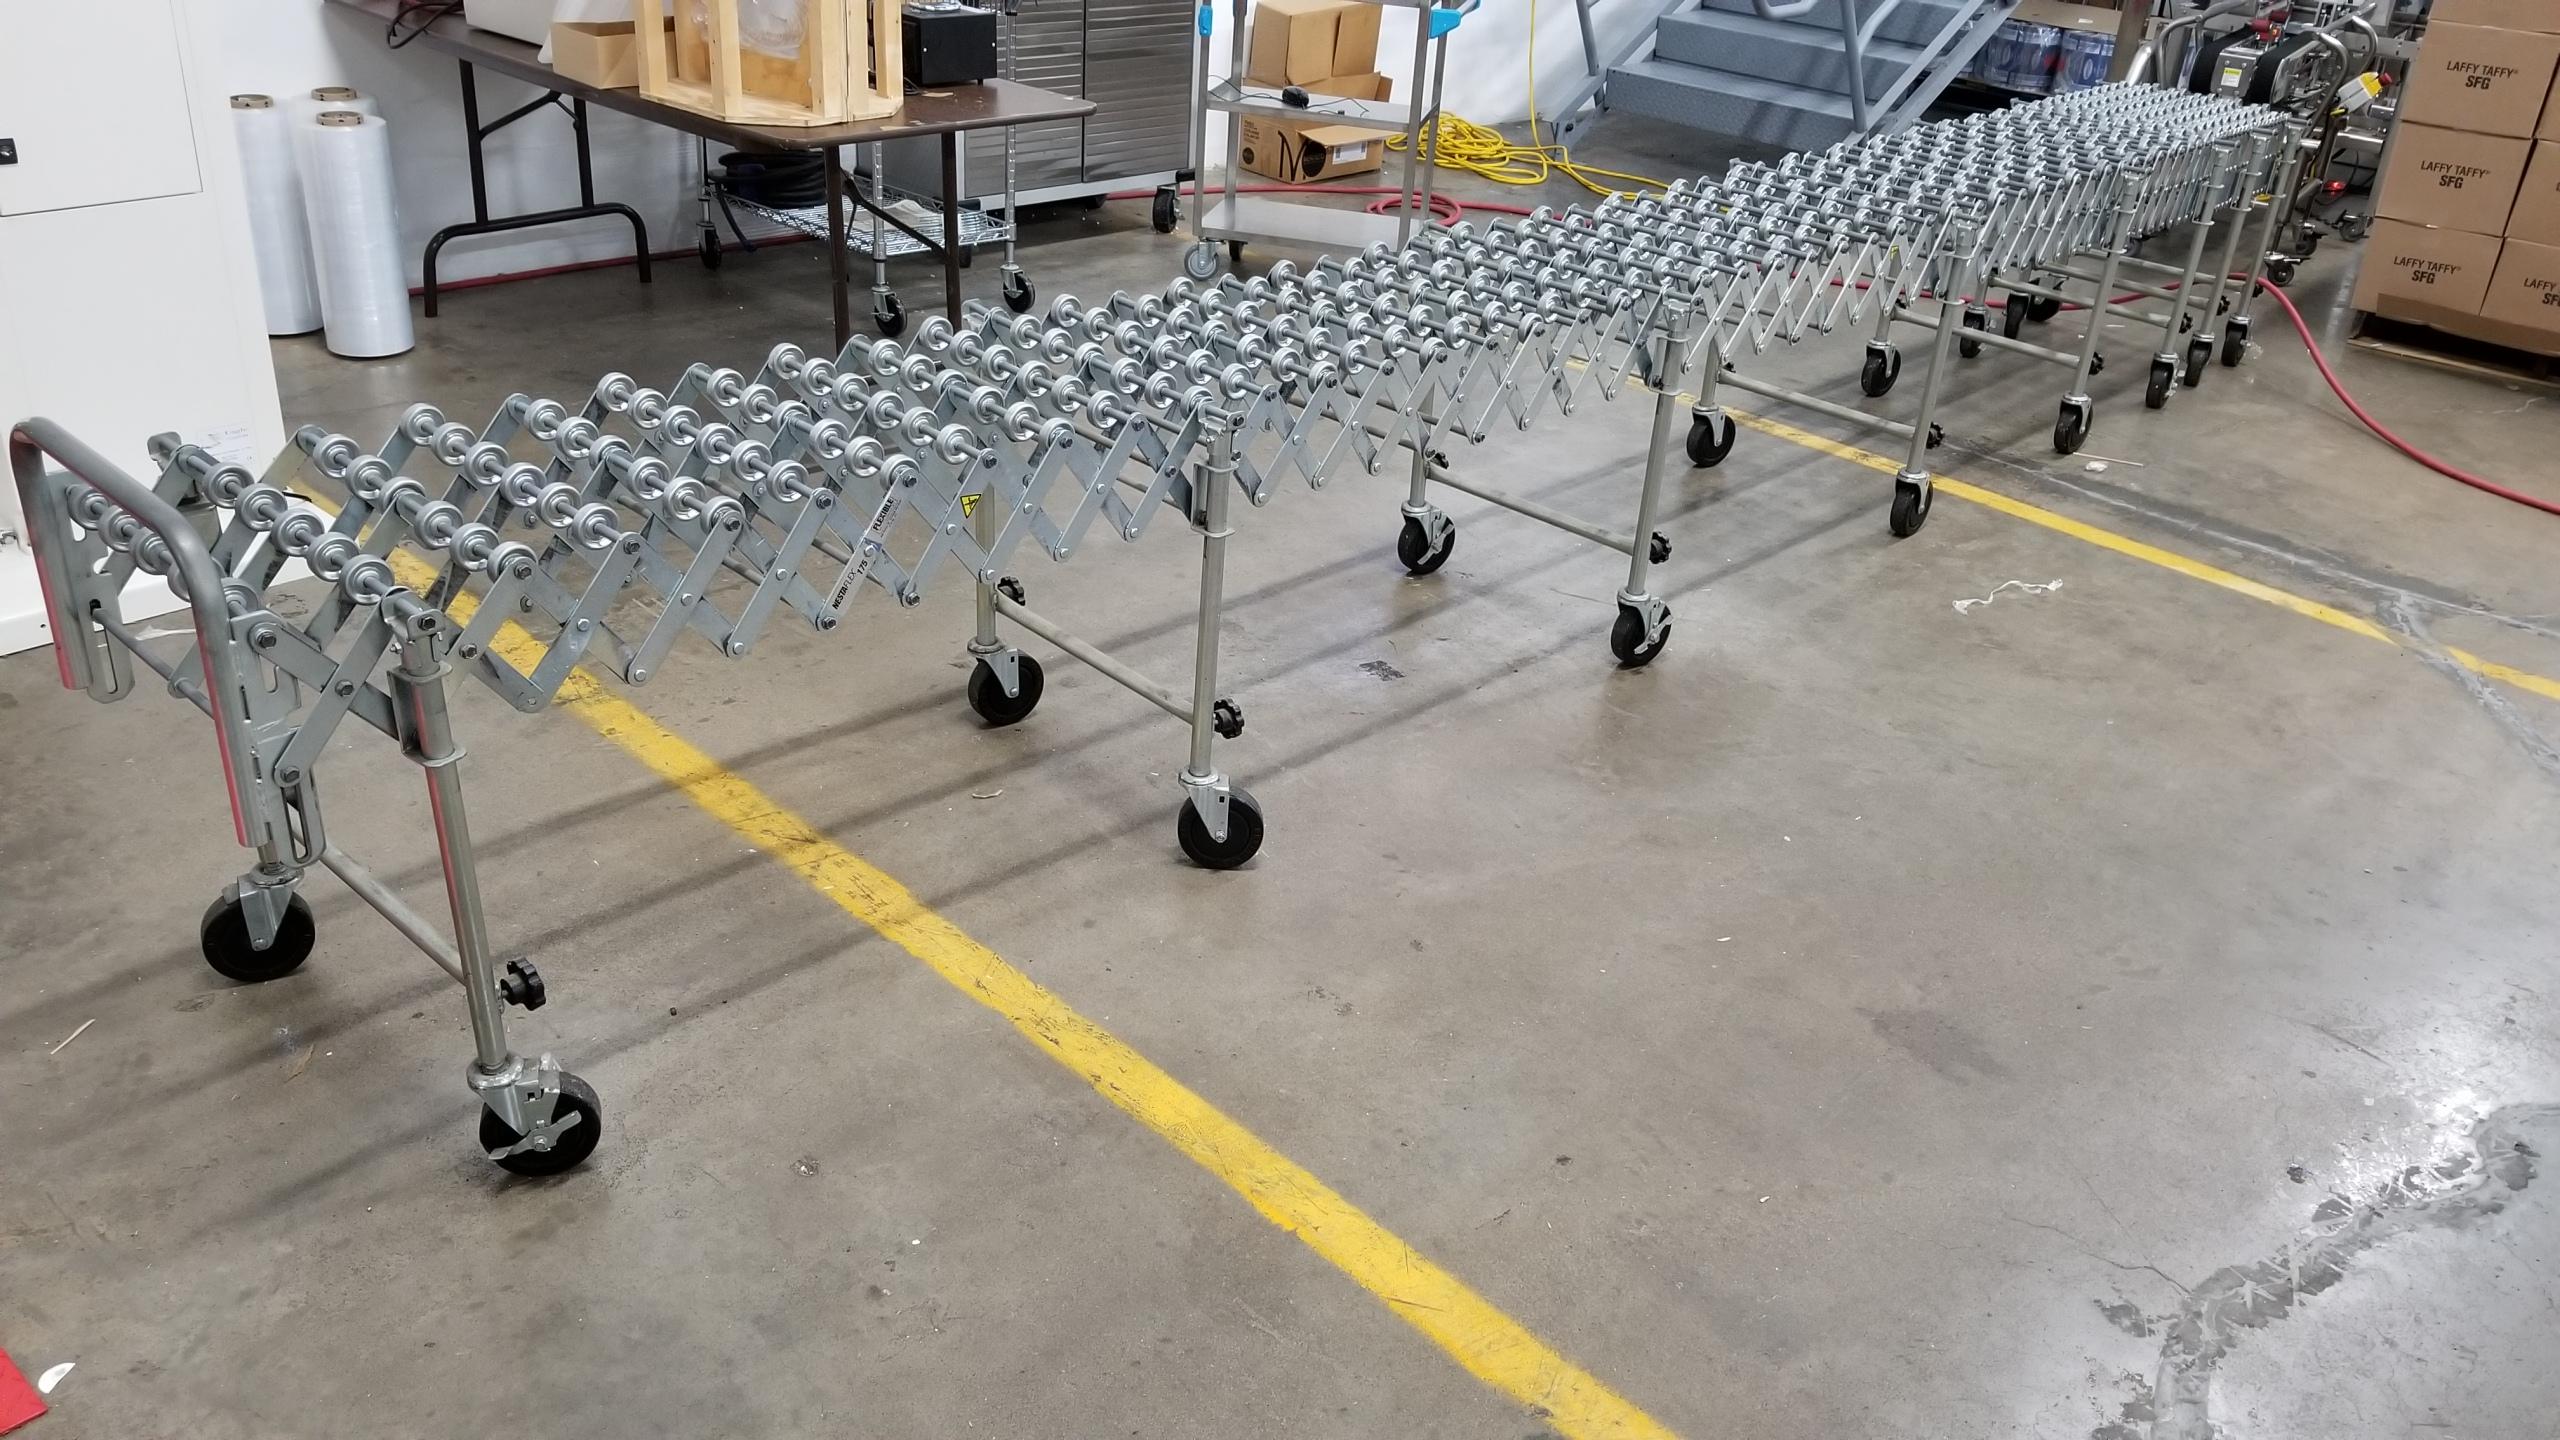 "Lot 51 - Nestaflex 175 approximately 18"" wide x 21-ft long Skate Conveyor"